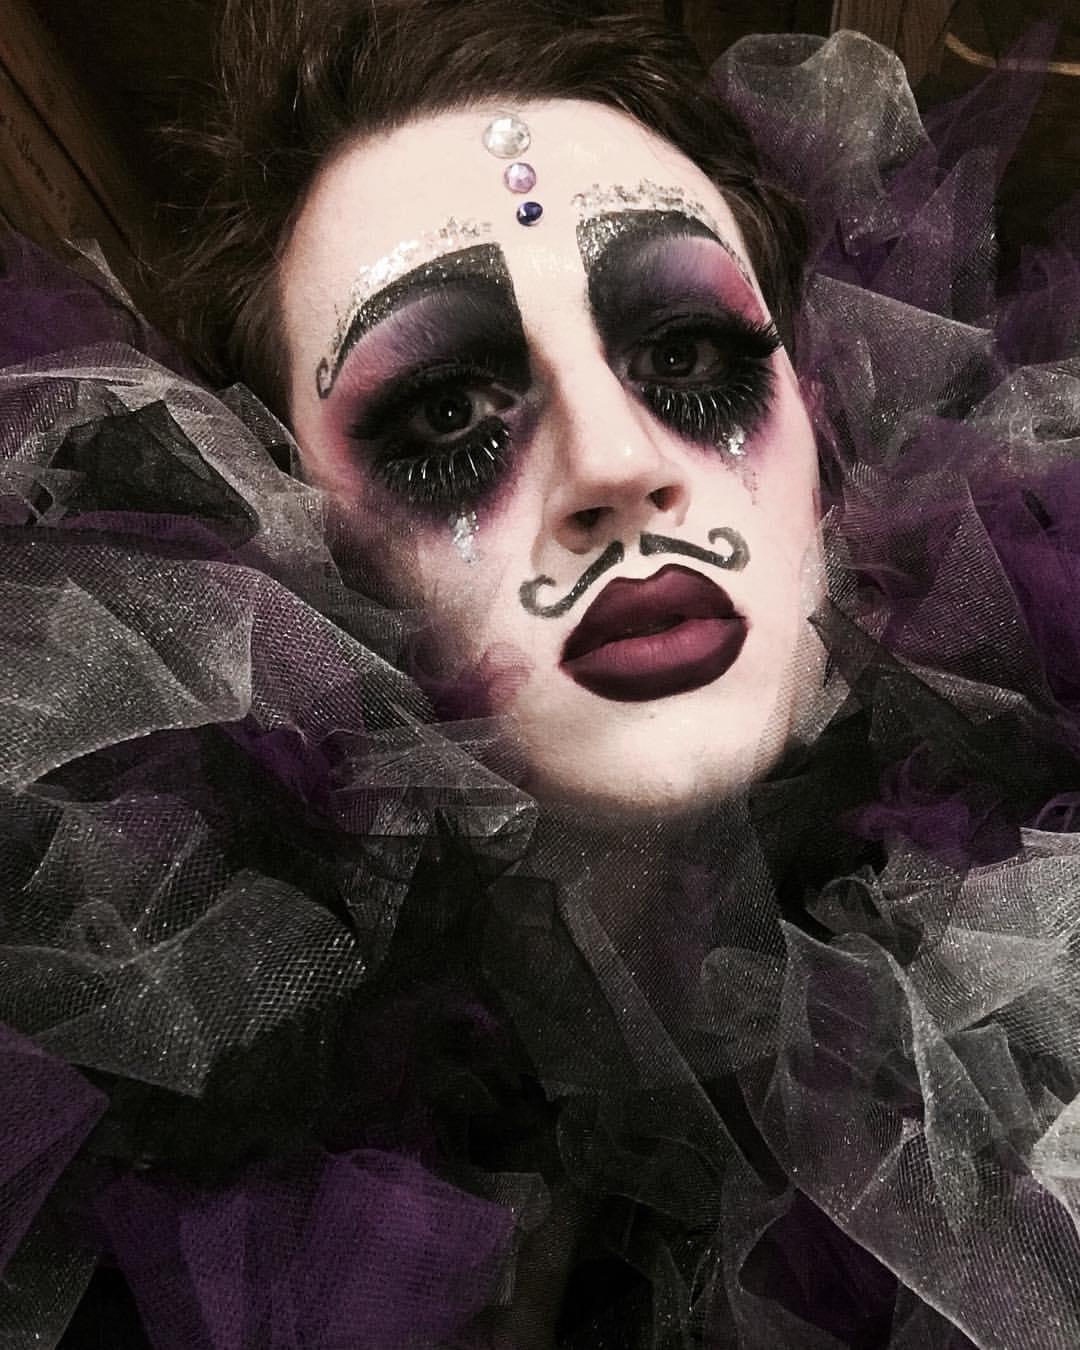 Willy LaQueue - Sad Clown.jpg